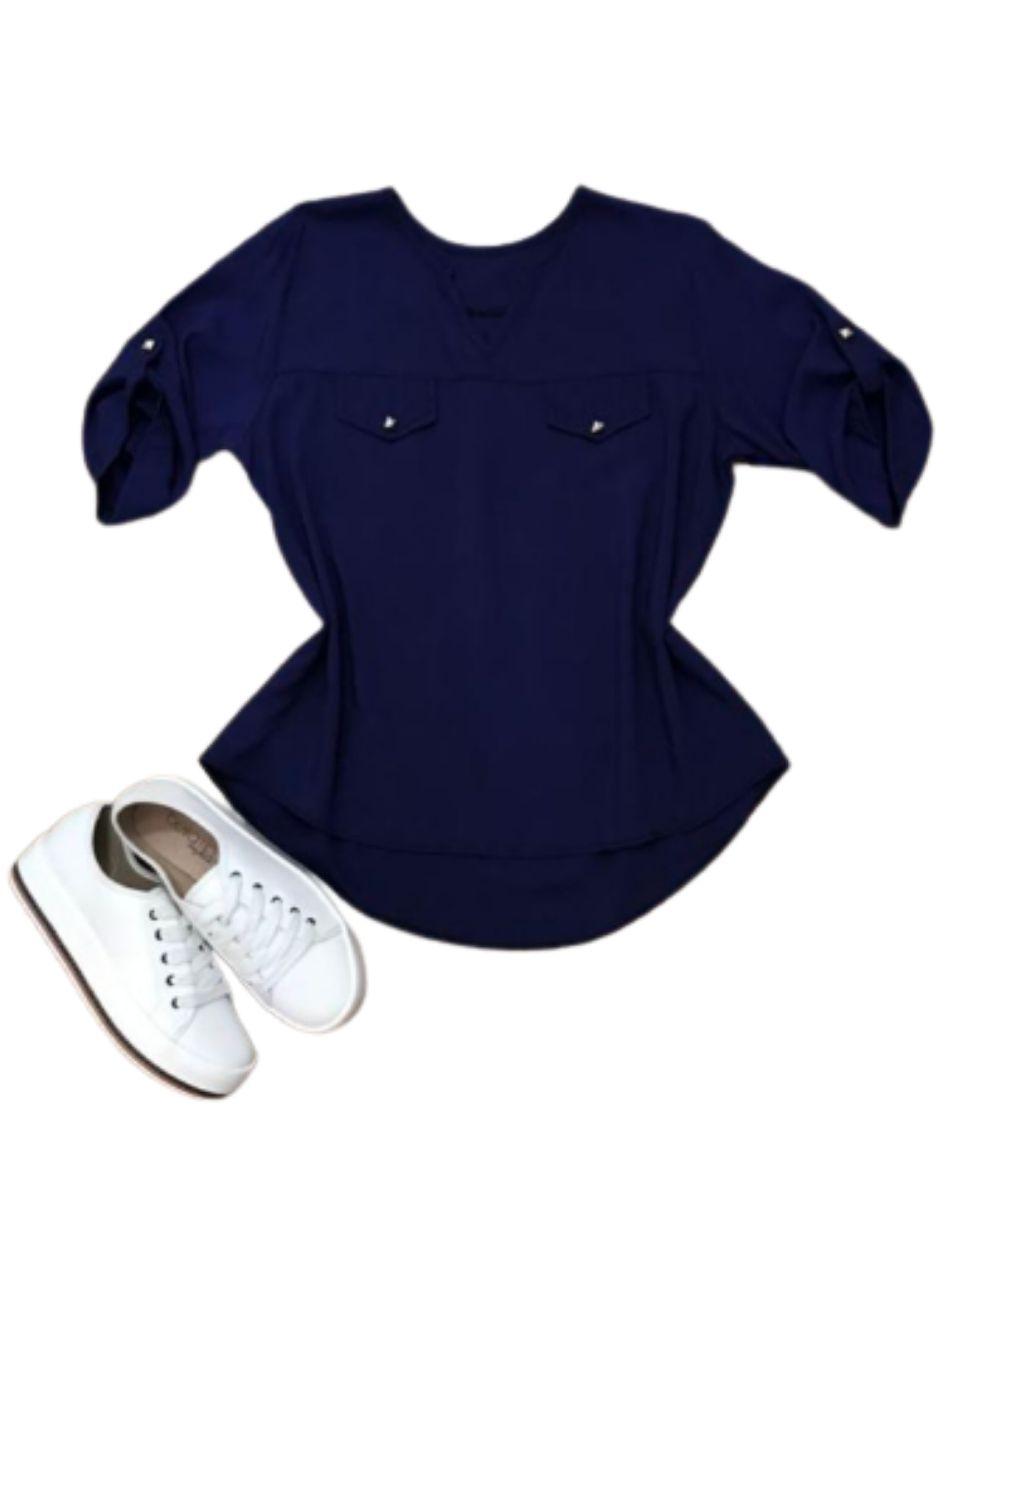 Camisa Blusa Feminina Manga Curta Social Lisa Azul Marinho  - ModaStore   Moda Feminina